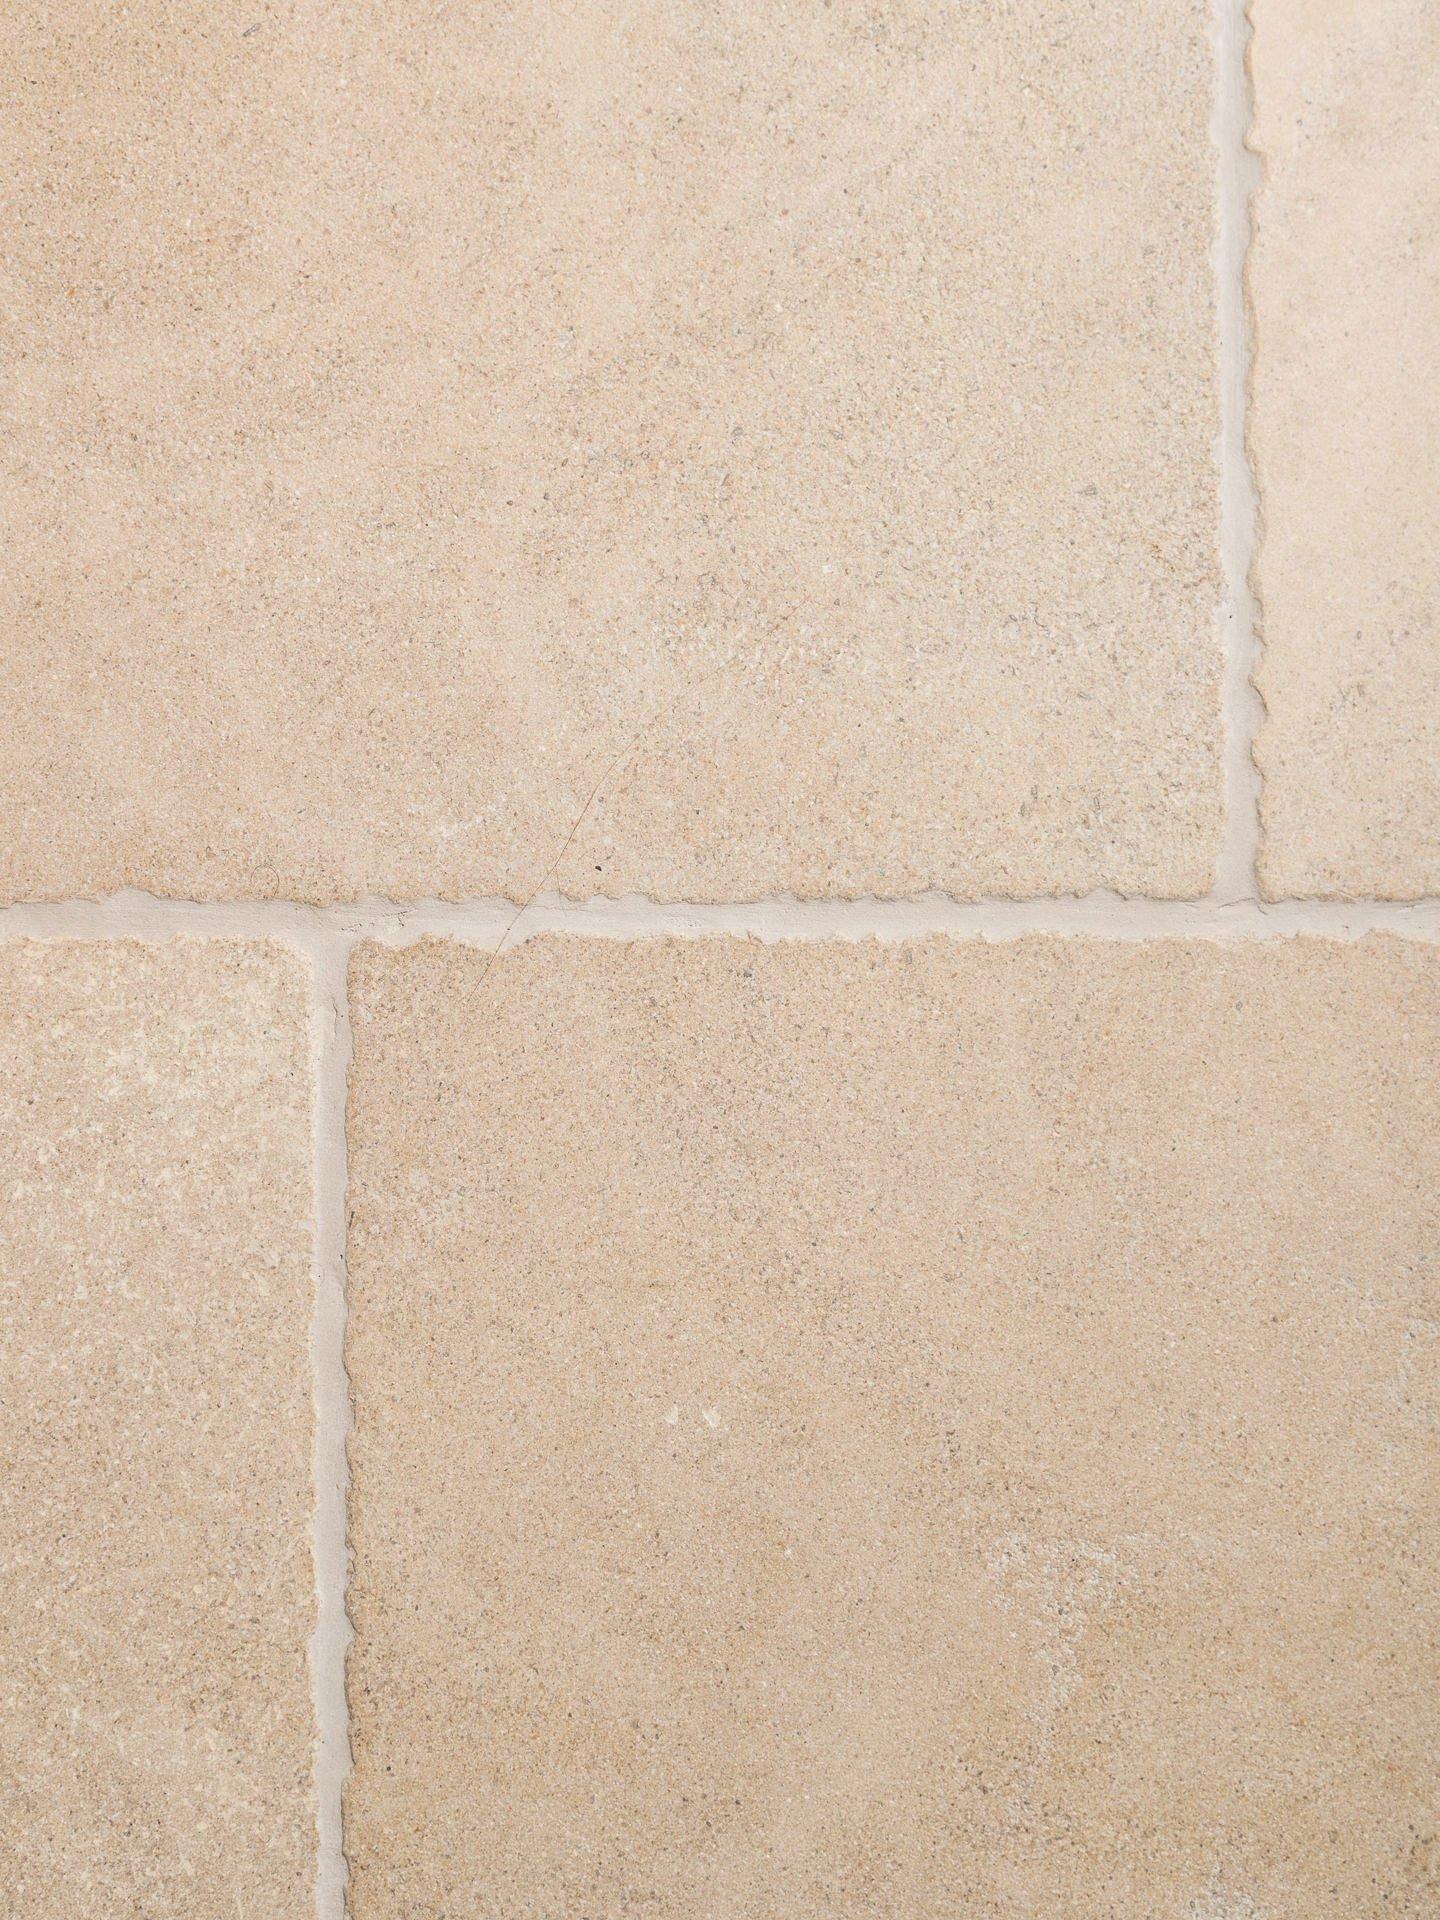 century-limestone-swatch